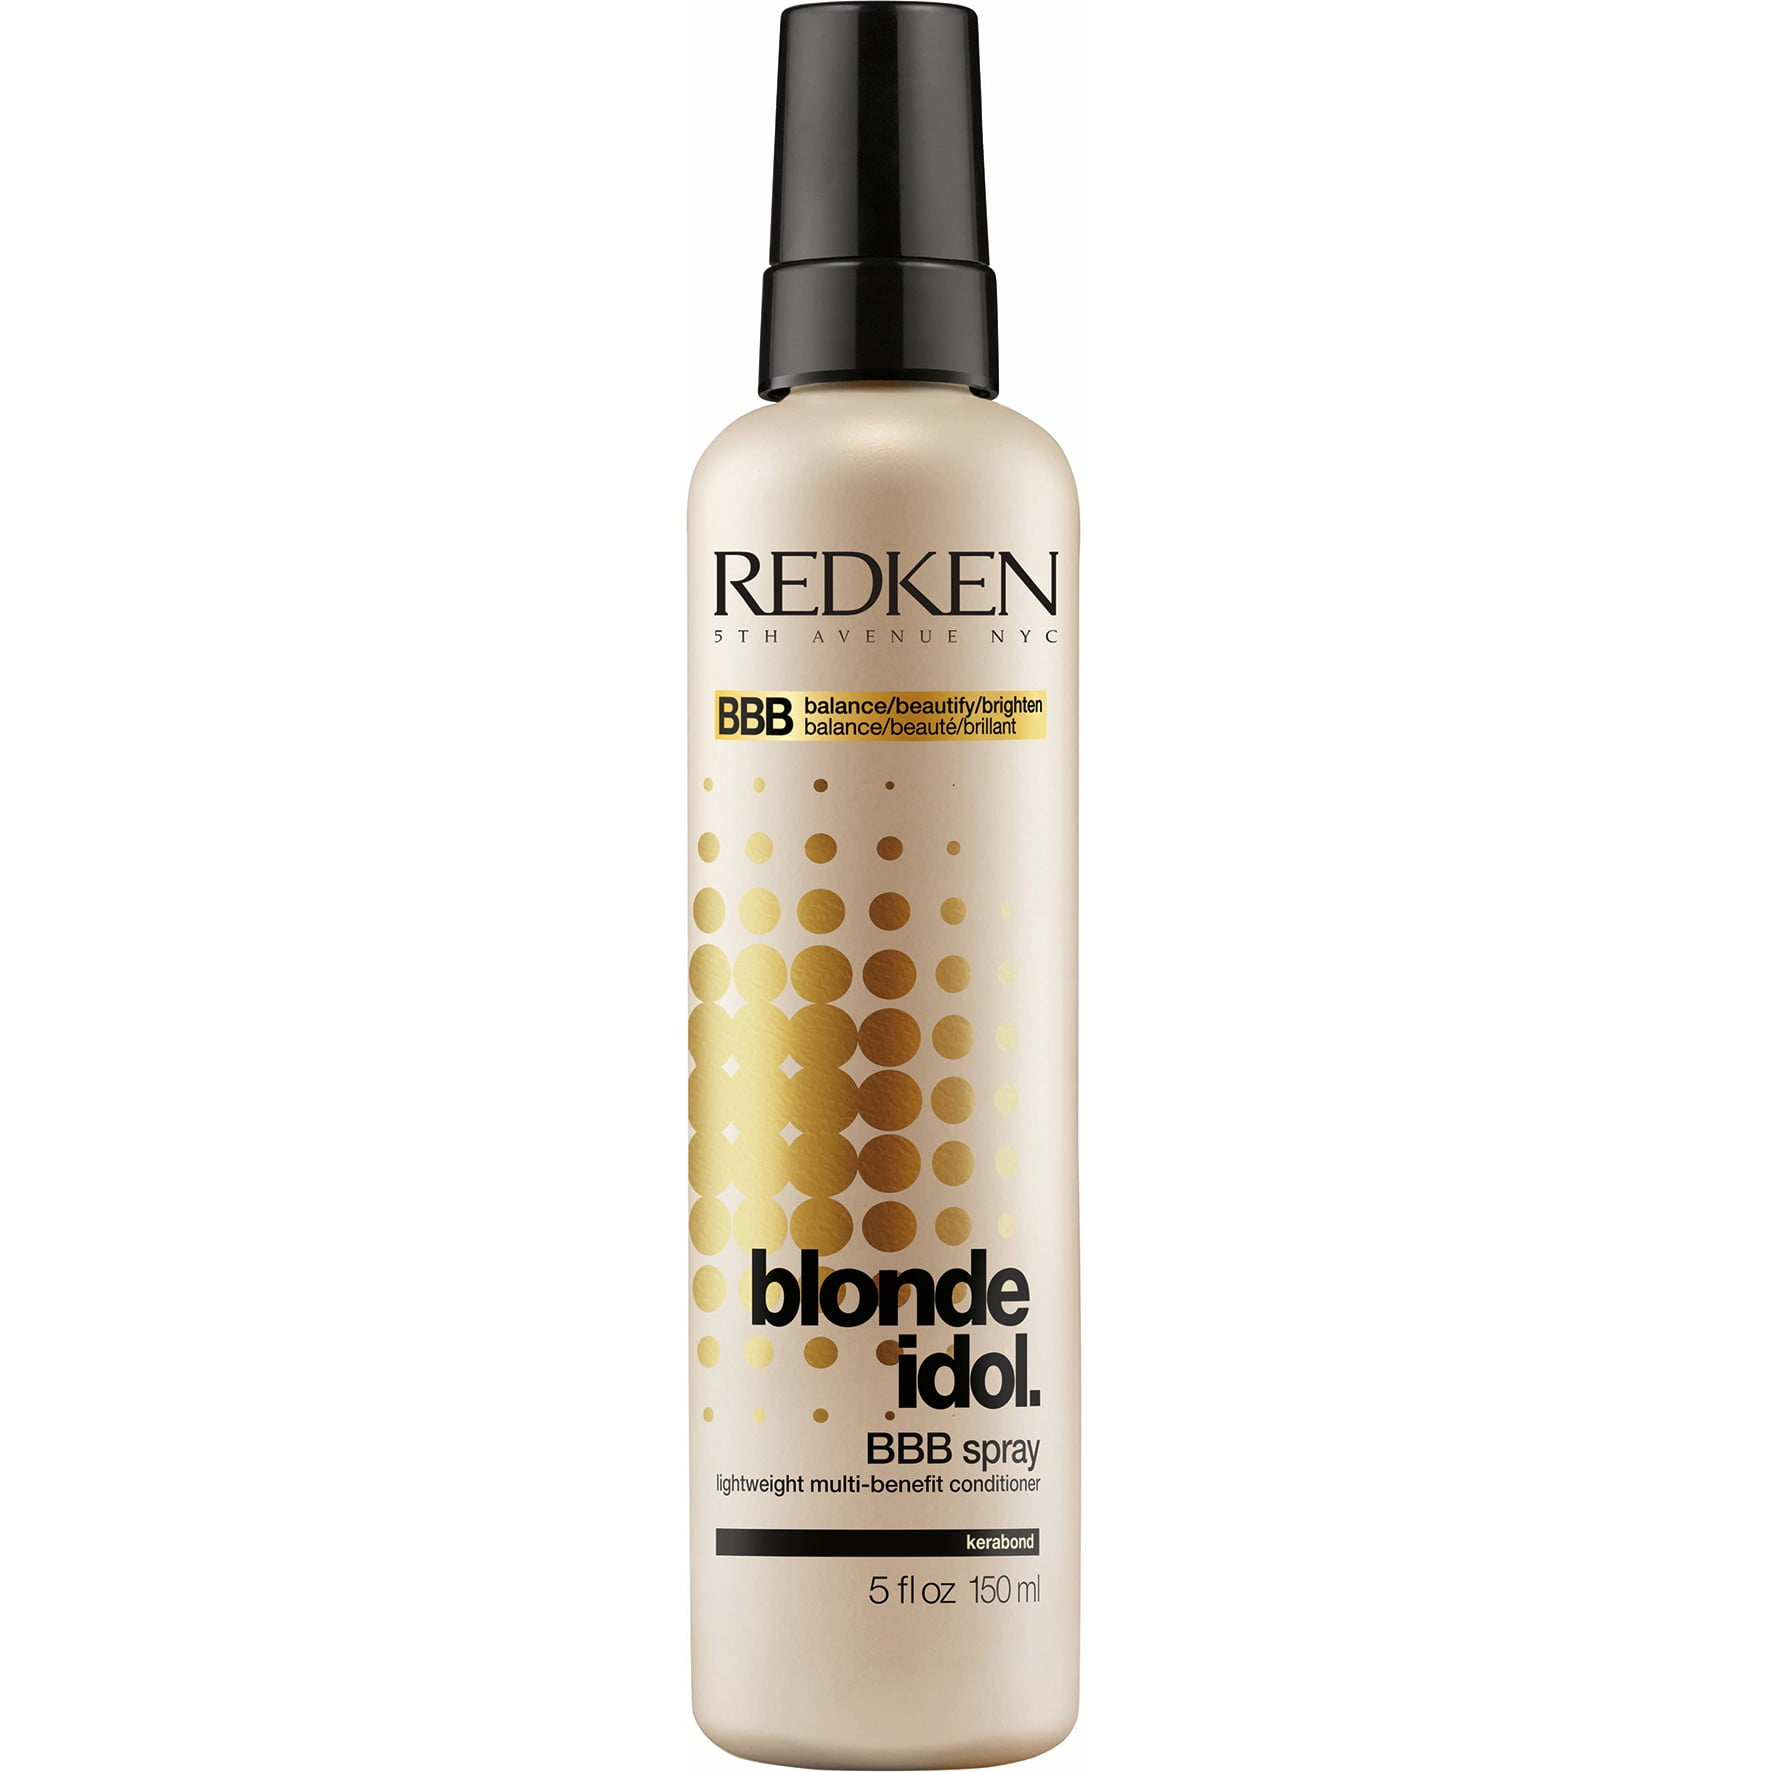 Redken Blonde Idol BBB Spray - 150ml